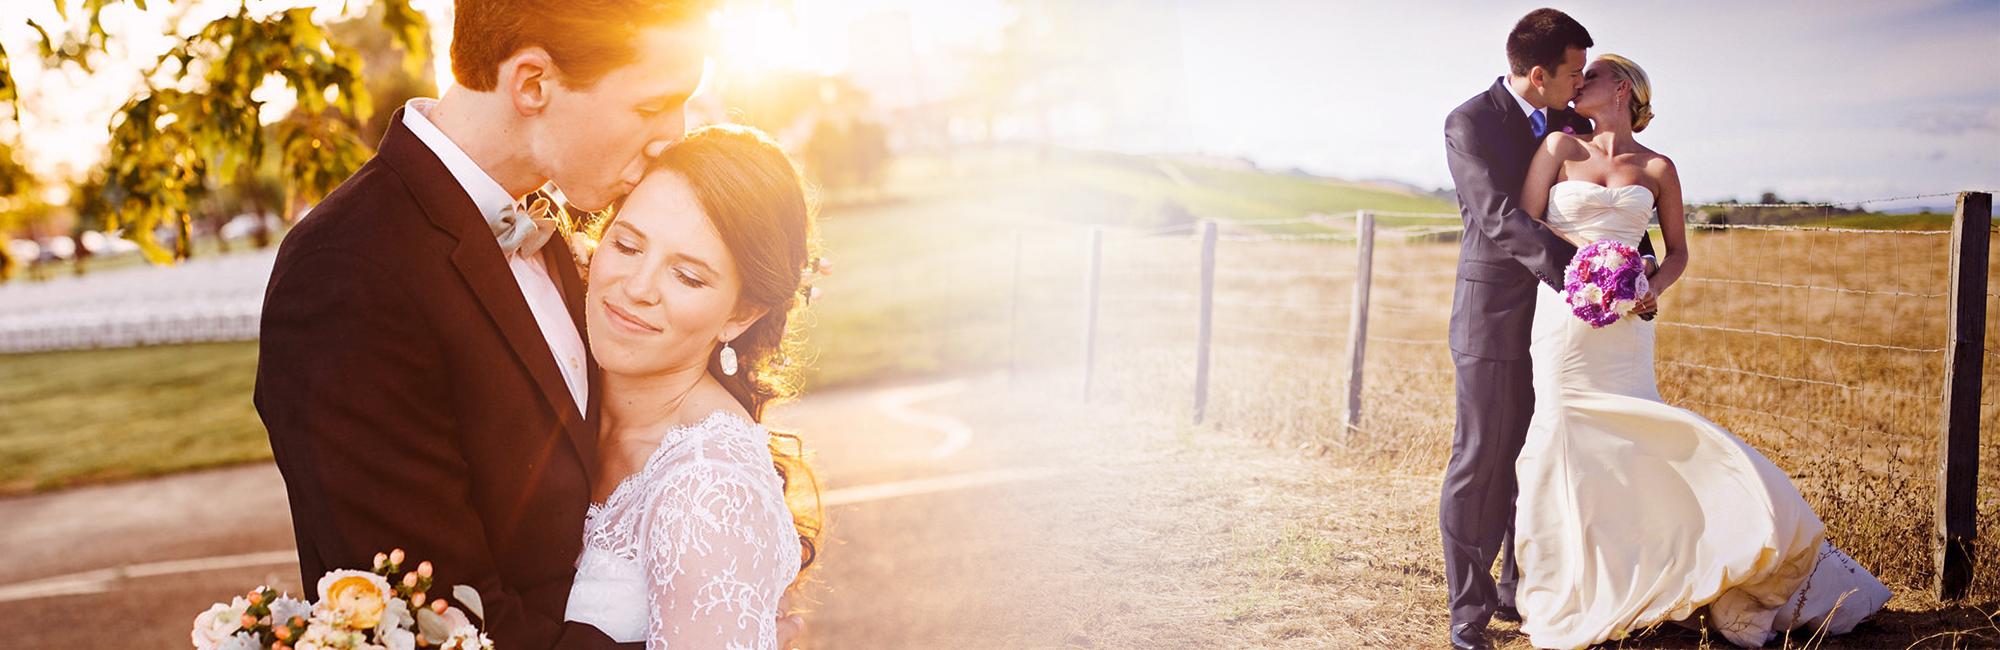 Fotografia e video Matrimoni